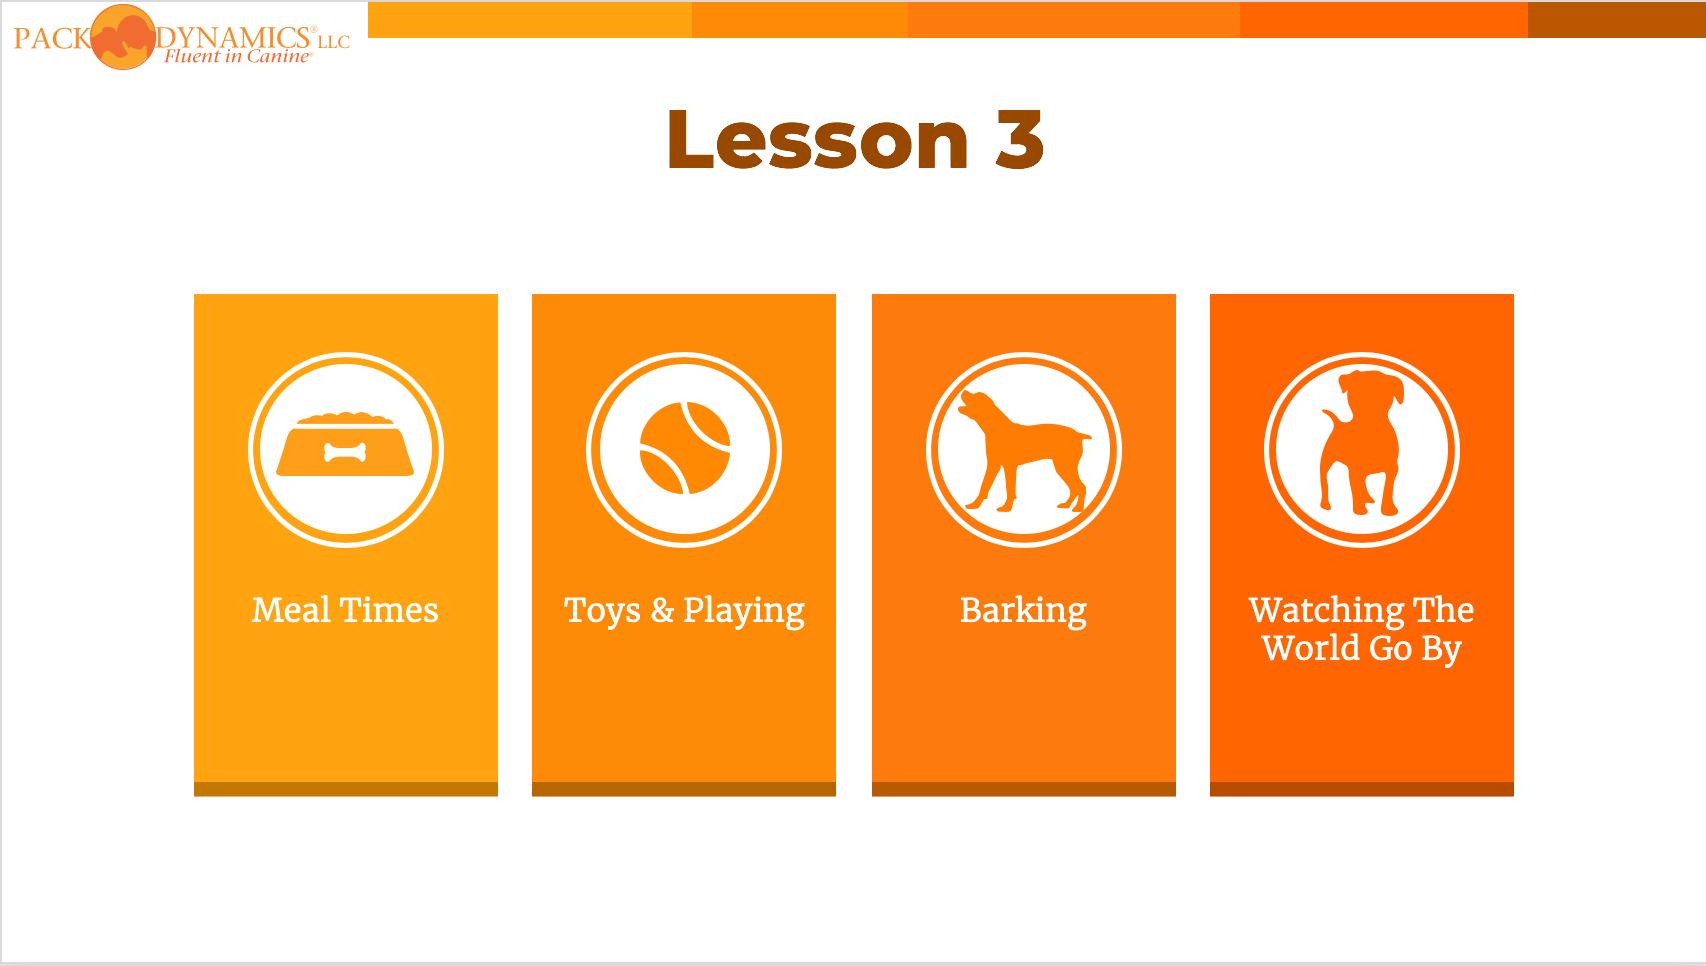 Pack Dynamics - Online Course - Lesson 3.png